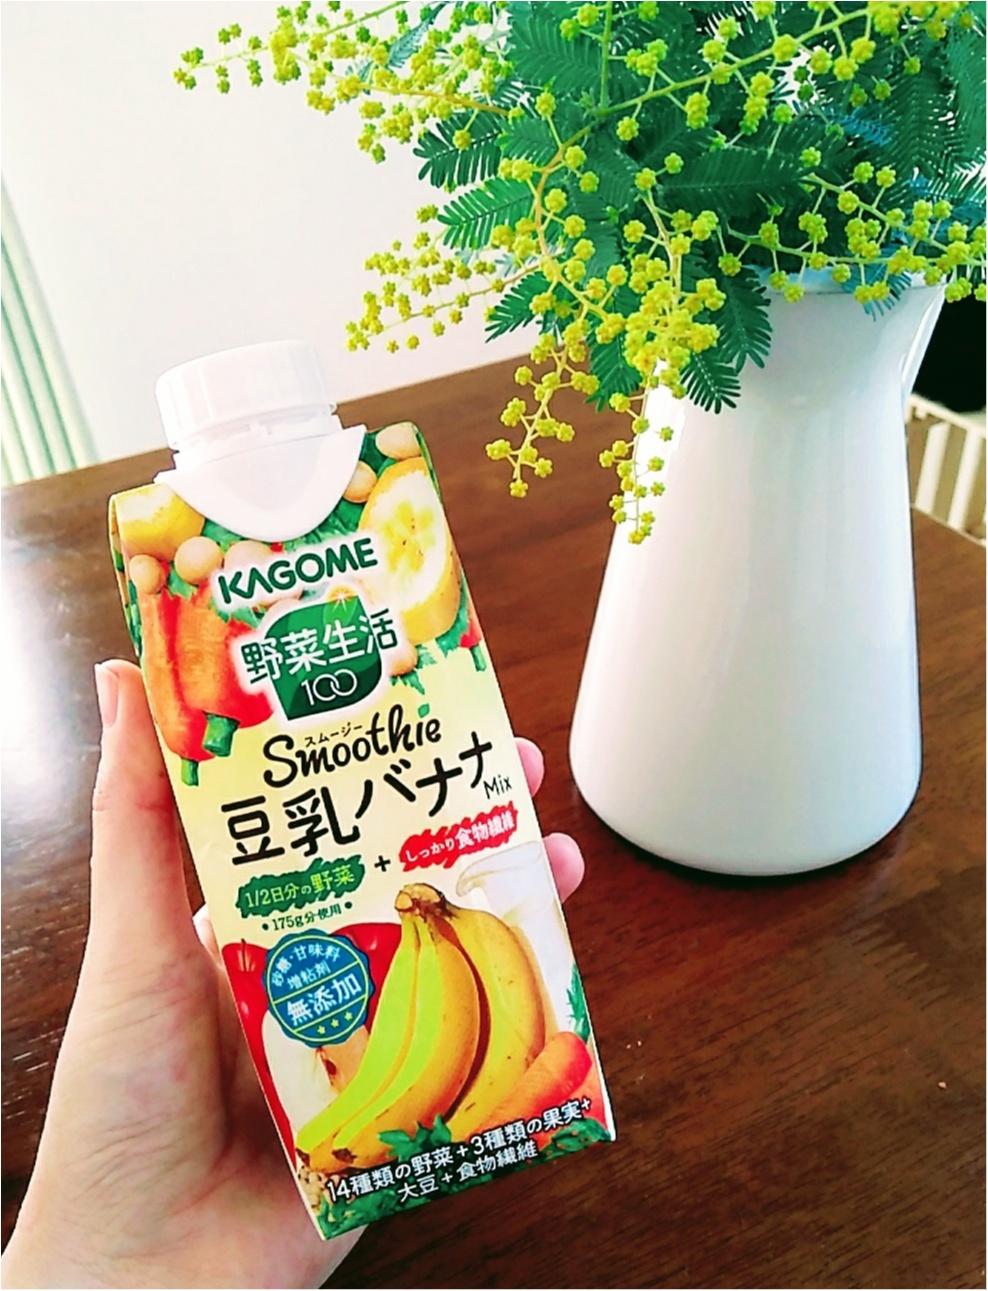 KAGOME野菜生活《豆乳バナナスムージー》でお野菜と食物繊維を手軽に摂取♢(443 まゆ_3